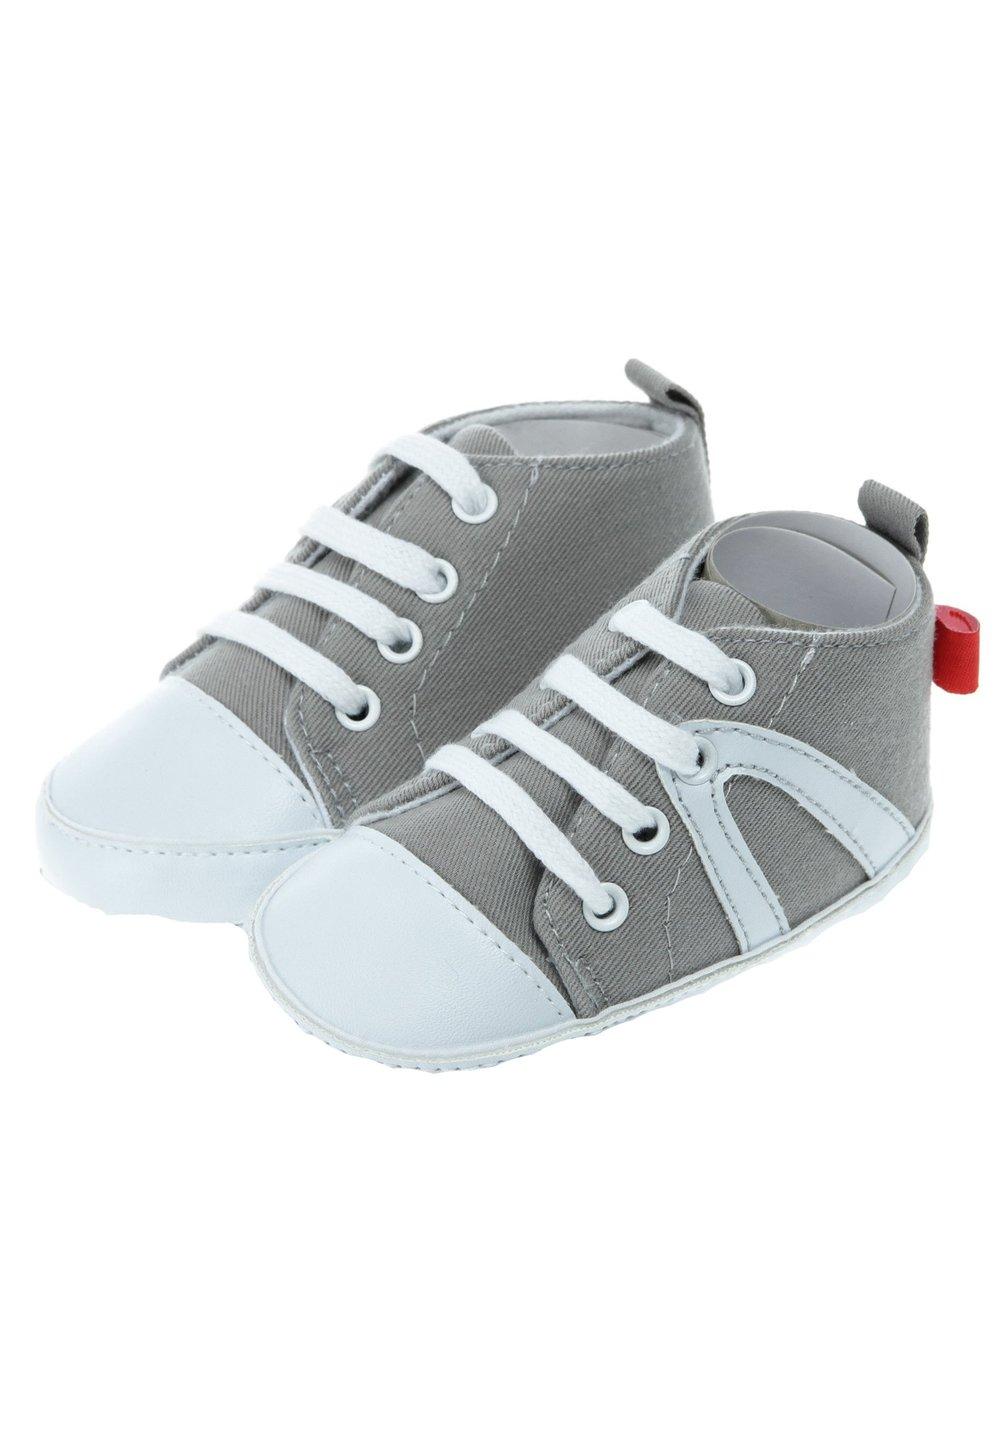 Papucei bebe gri imagine